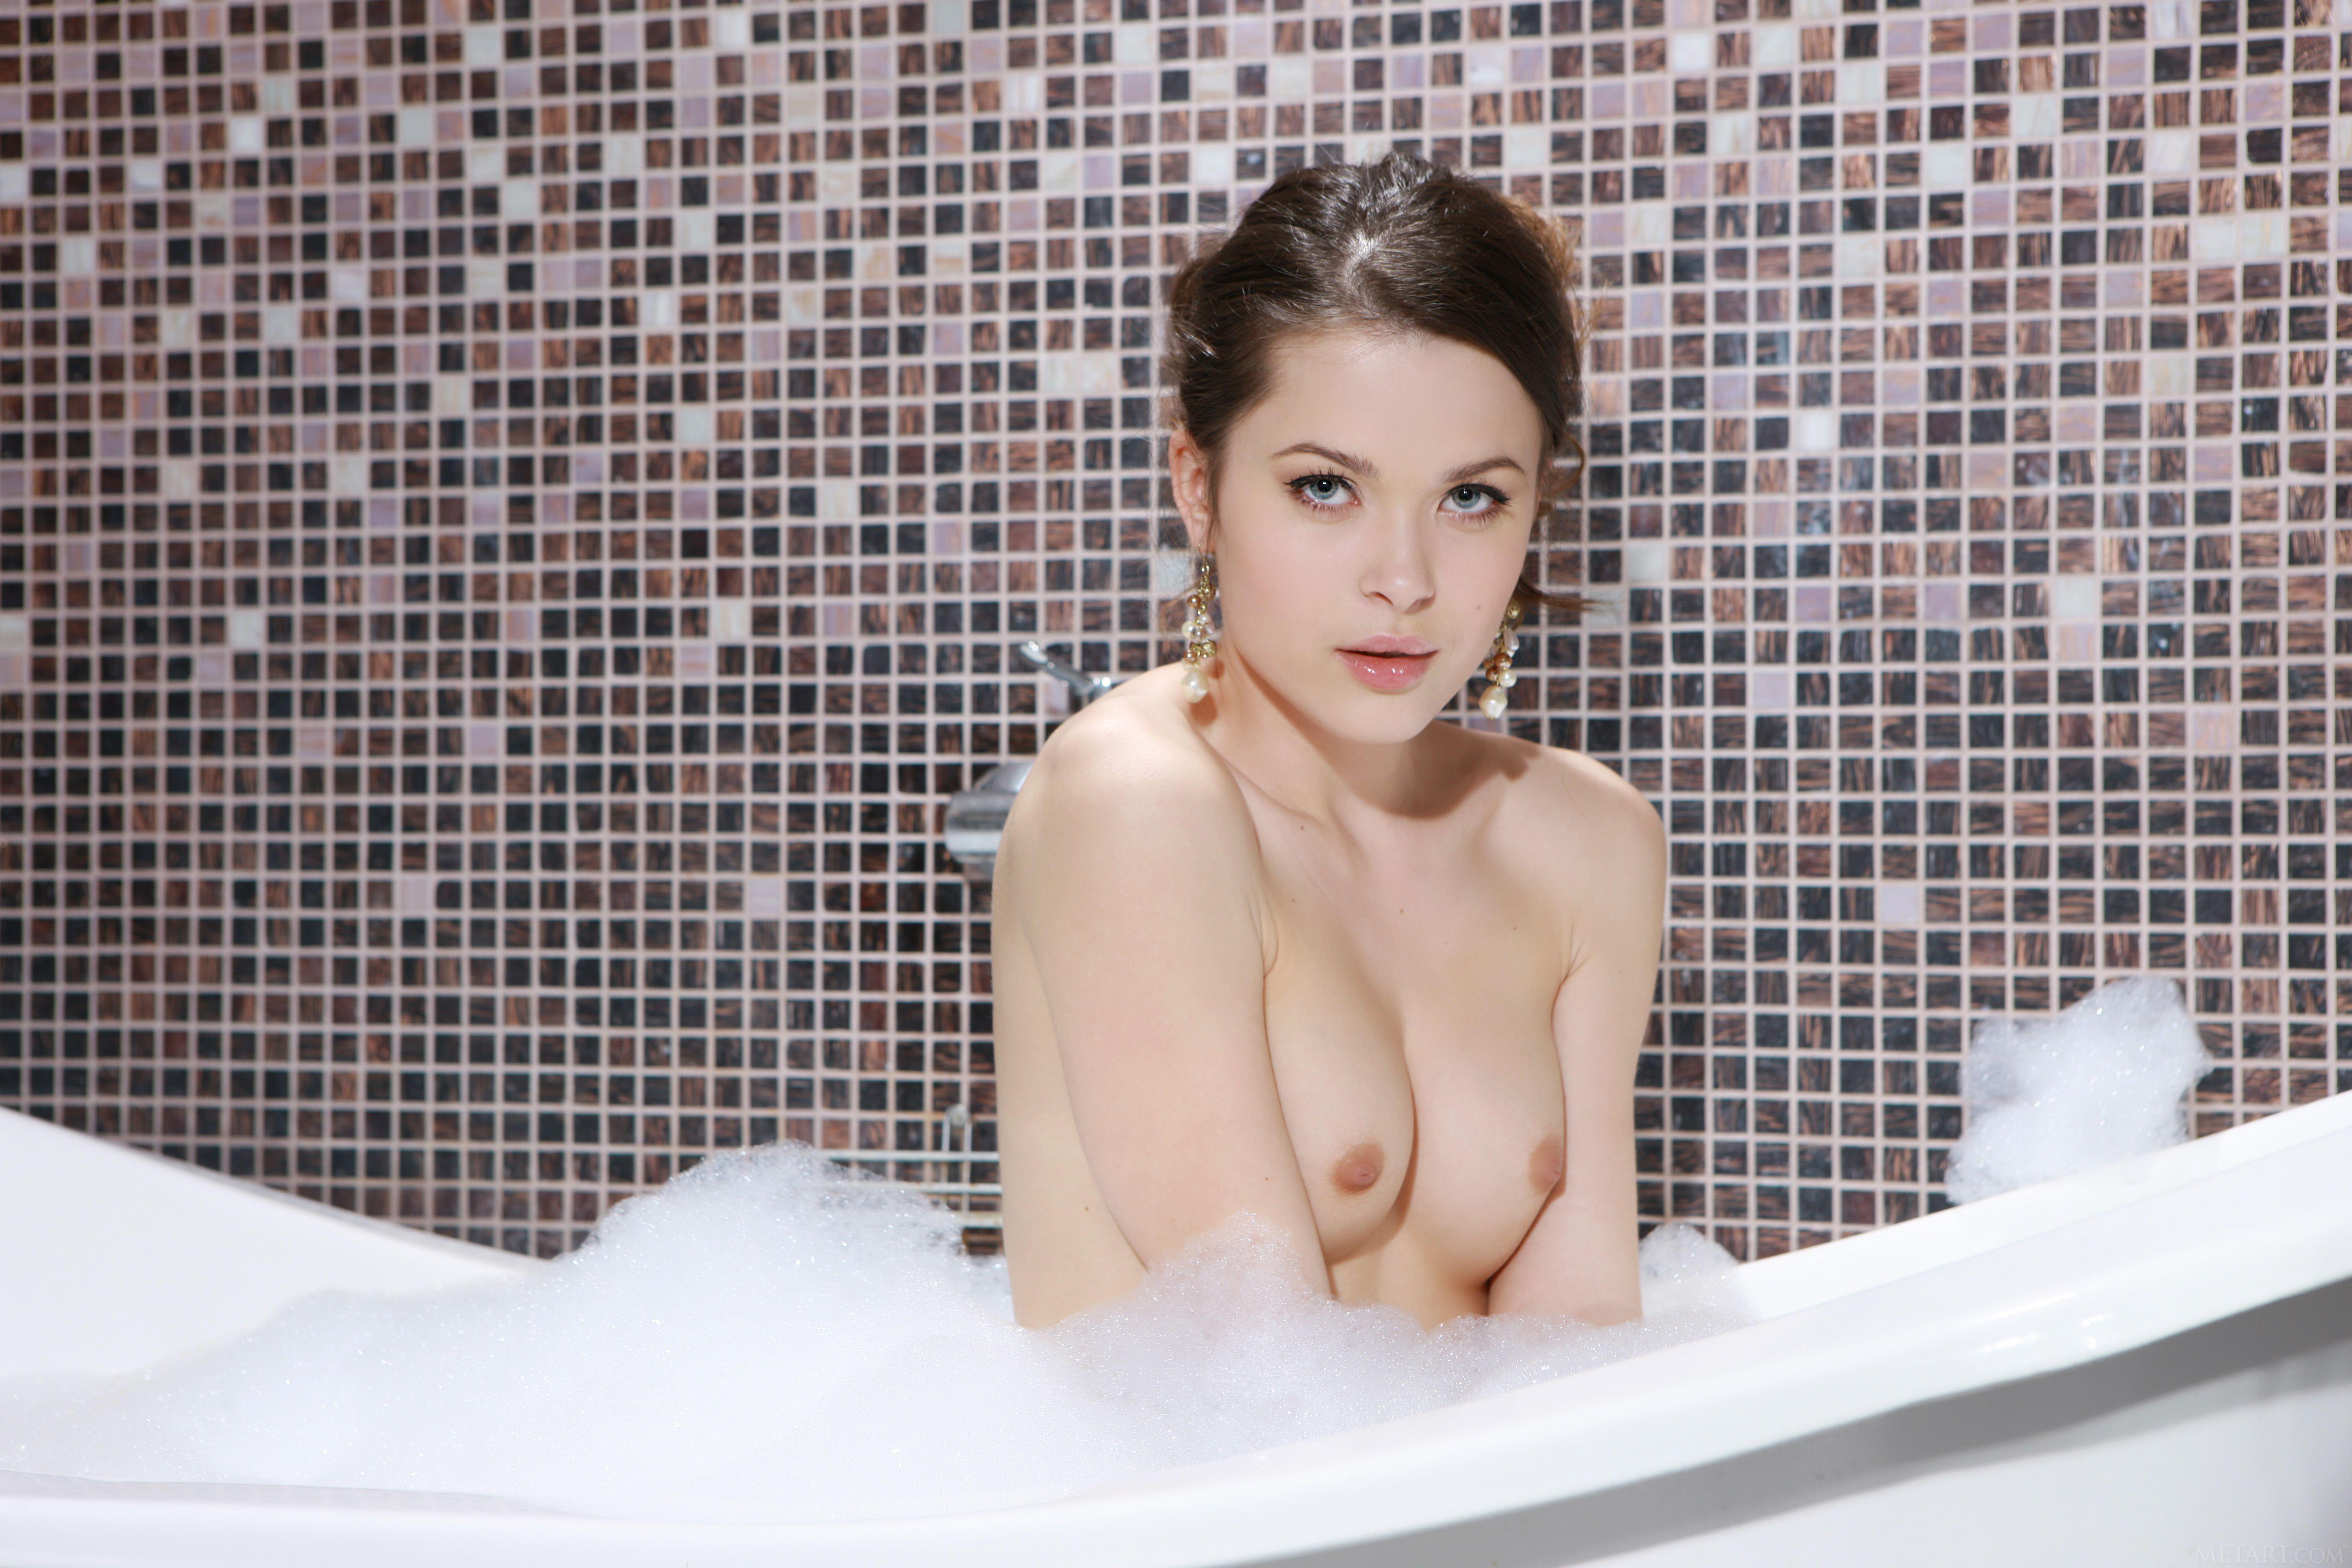 http://i2.imageban.ru/out/2013/05/22/07d5b7c11baf9f49d46129cf6288eced.jpg